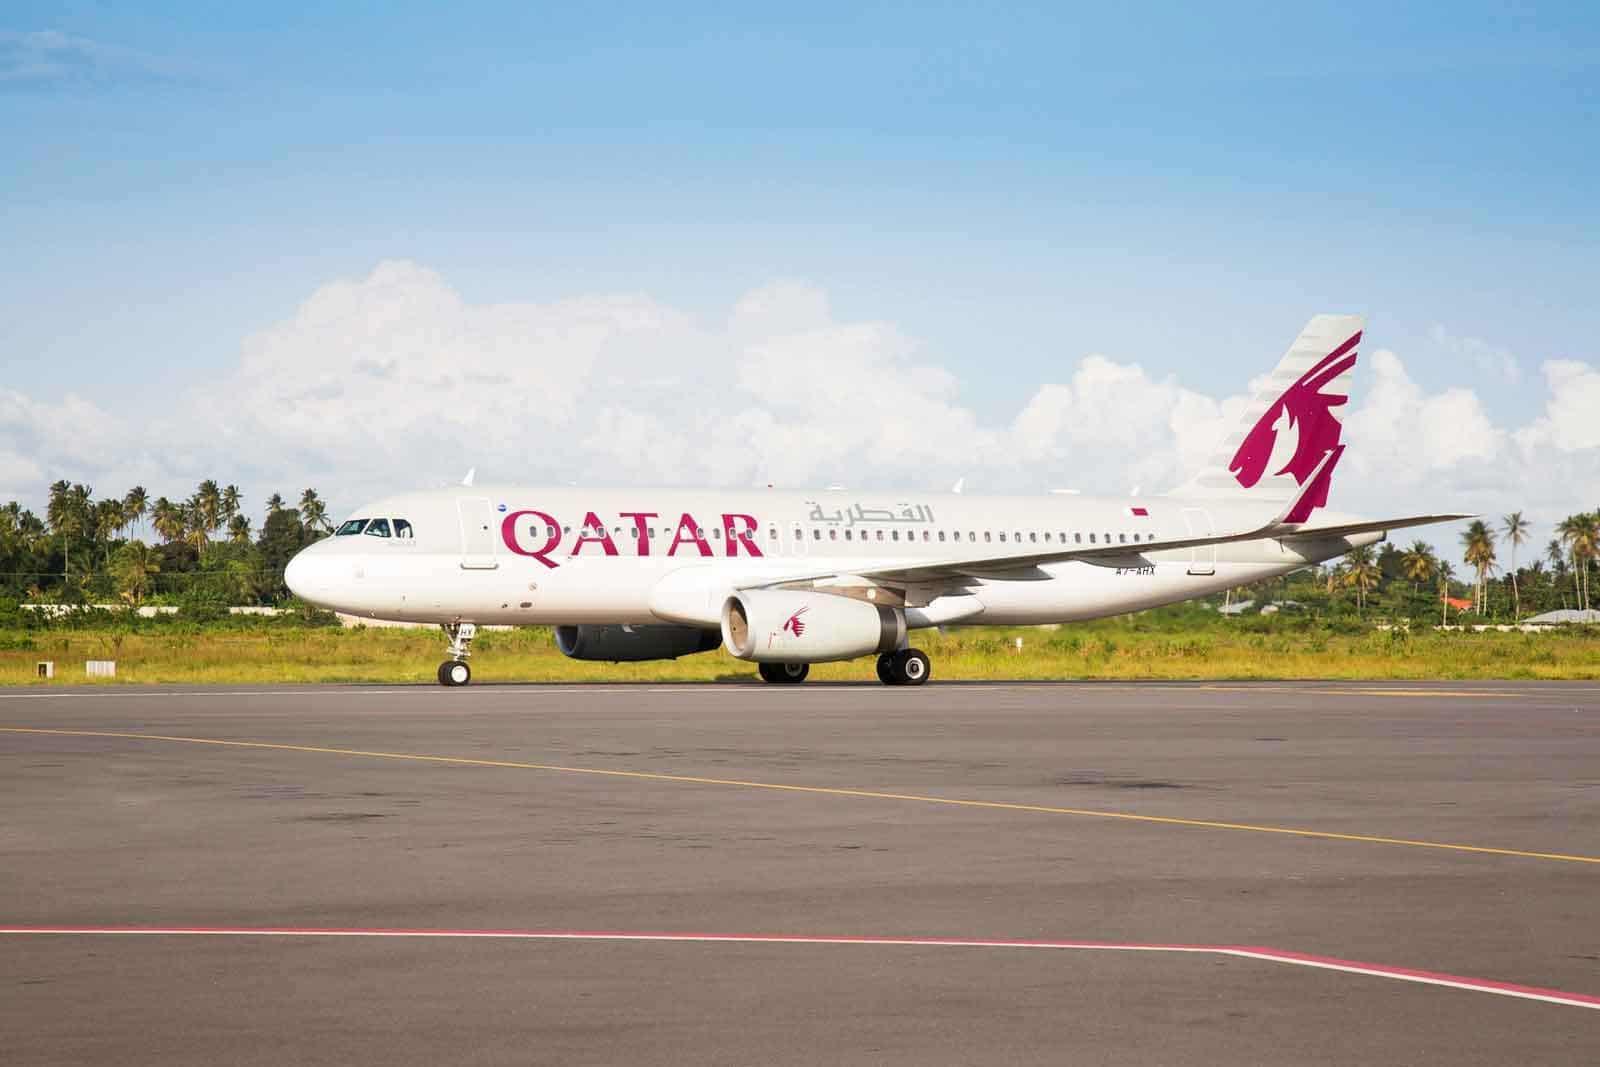 Qatar Airways' A320 inaugural flight from Doha to Zanzibar lands at Abeid Amani Karume International Airport